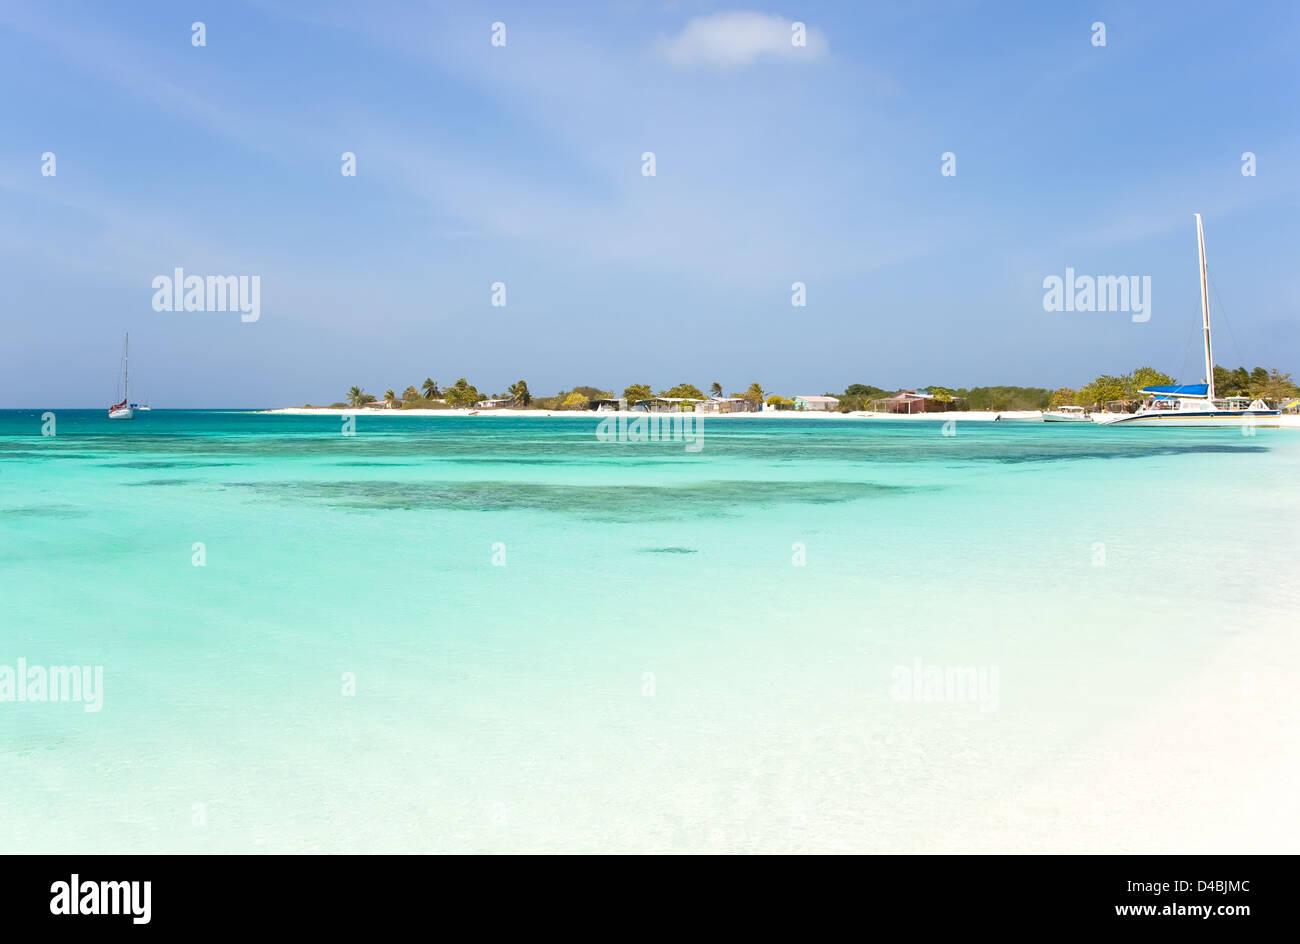 Tropical beach at archipelago Los Roques, Venezuela - Stock Image